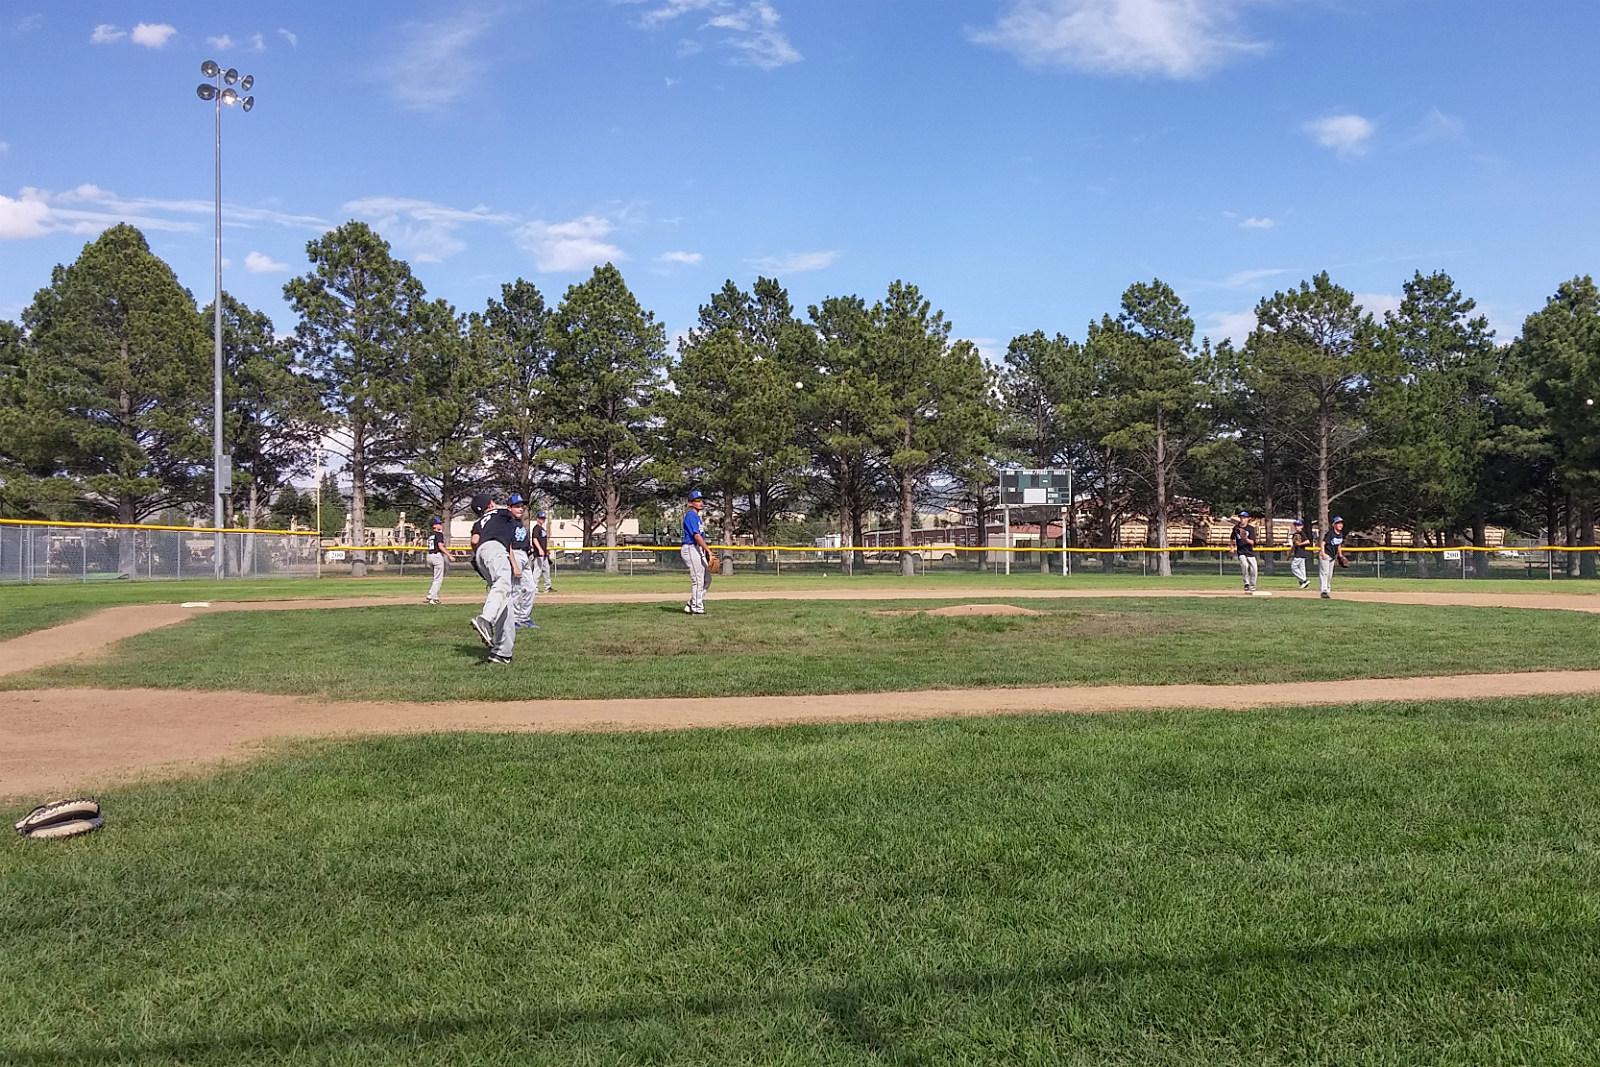 Laramie 11-12 All-Stars, Little League Baseball, Practice, 2017